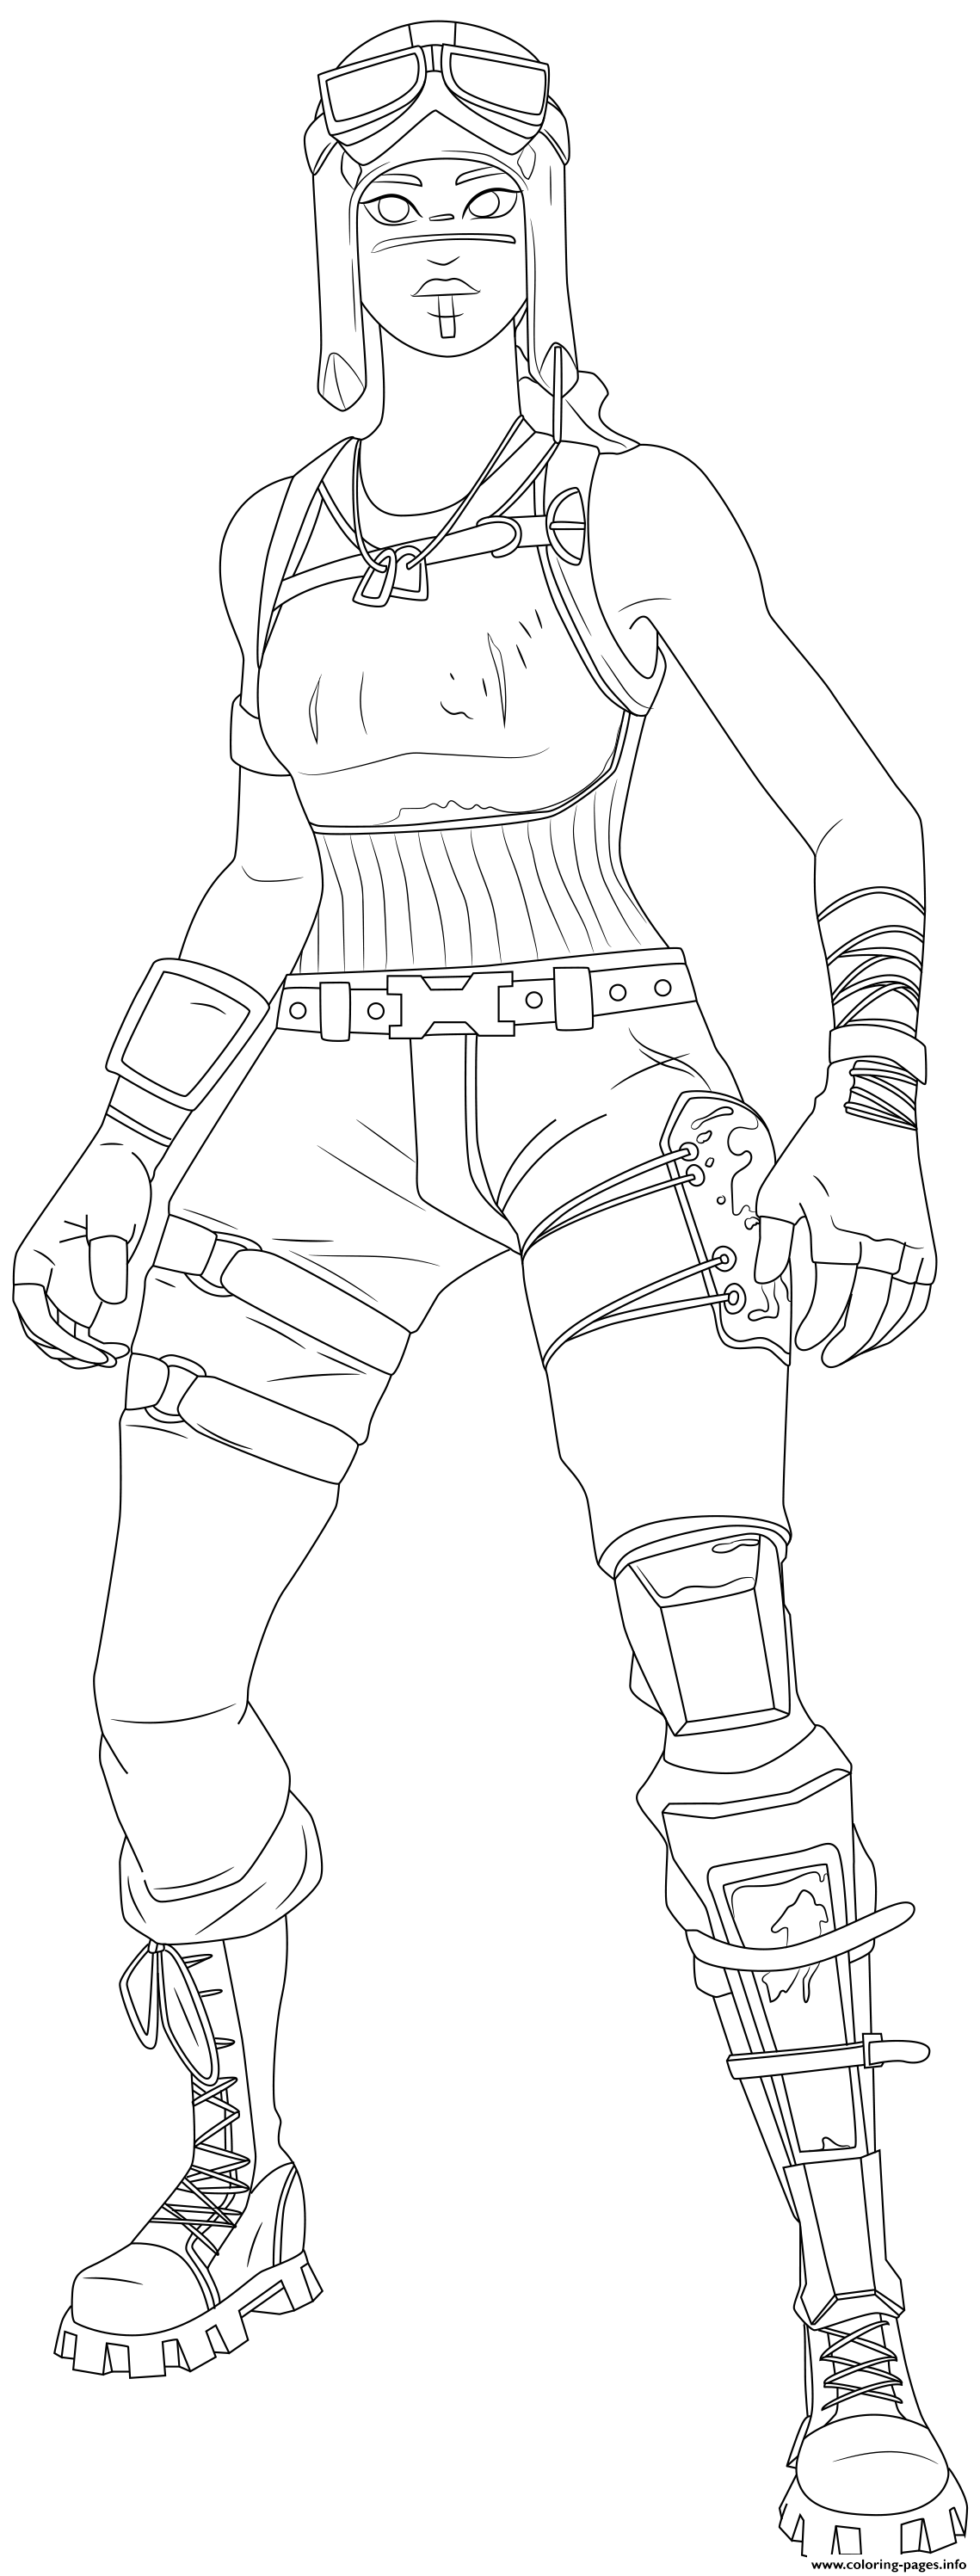 Renegade Raider Fortnite Skin Hd Coloring Pages Printable